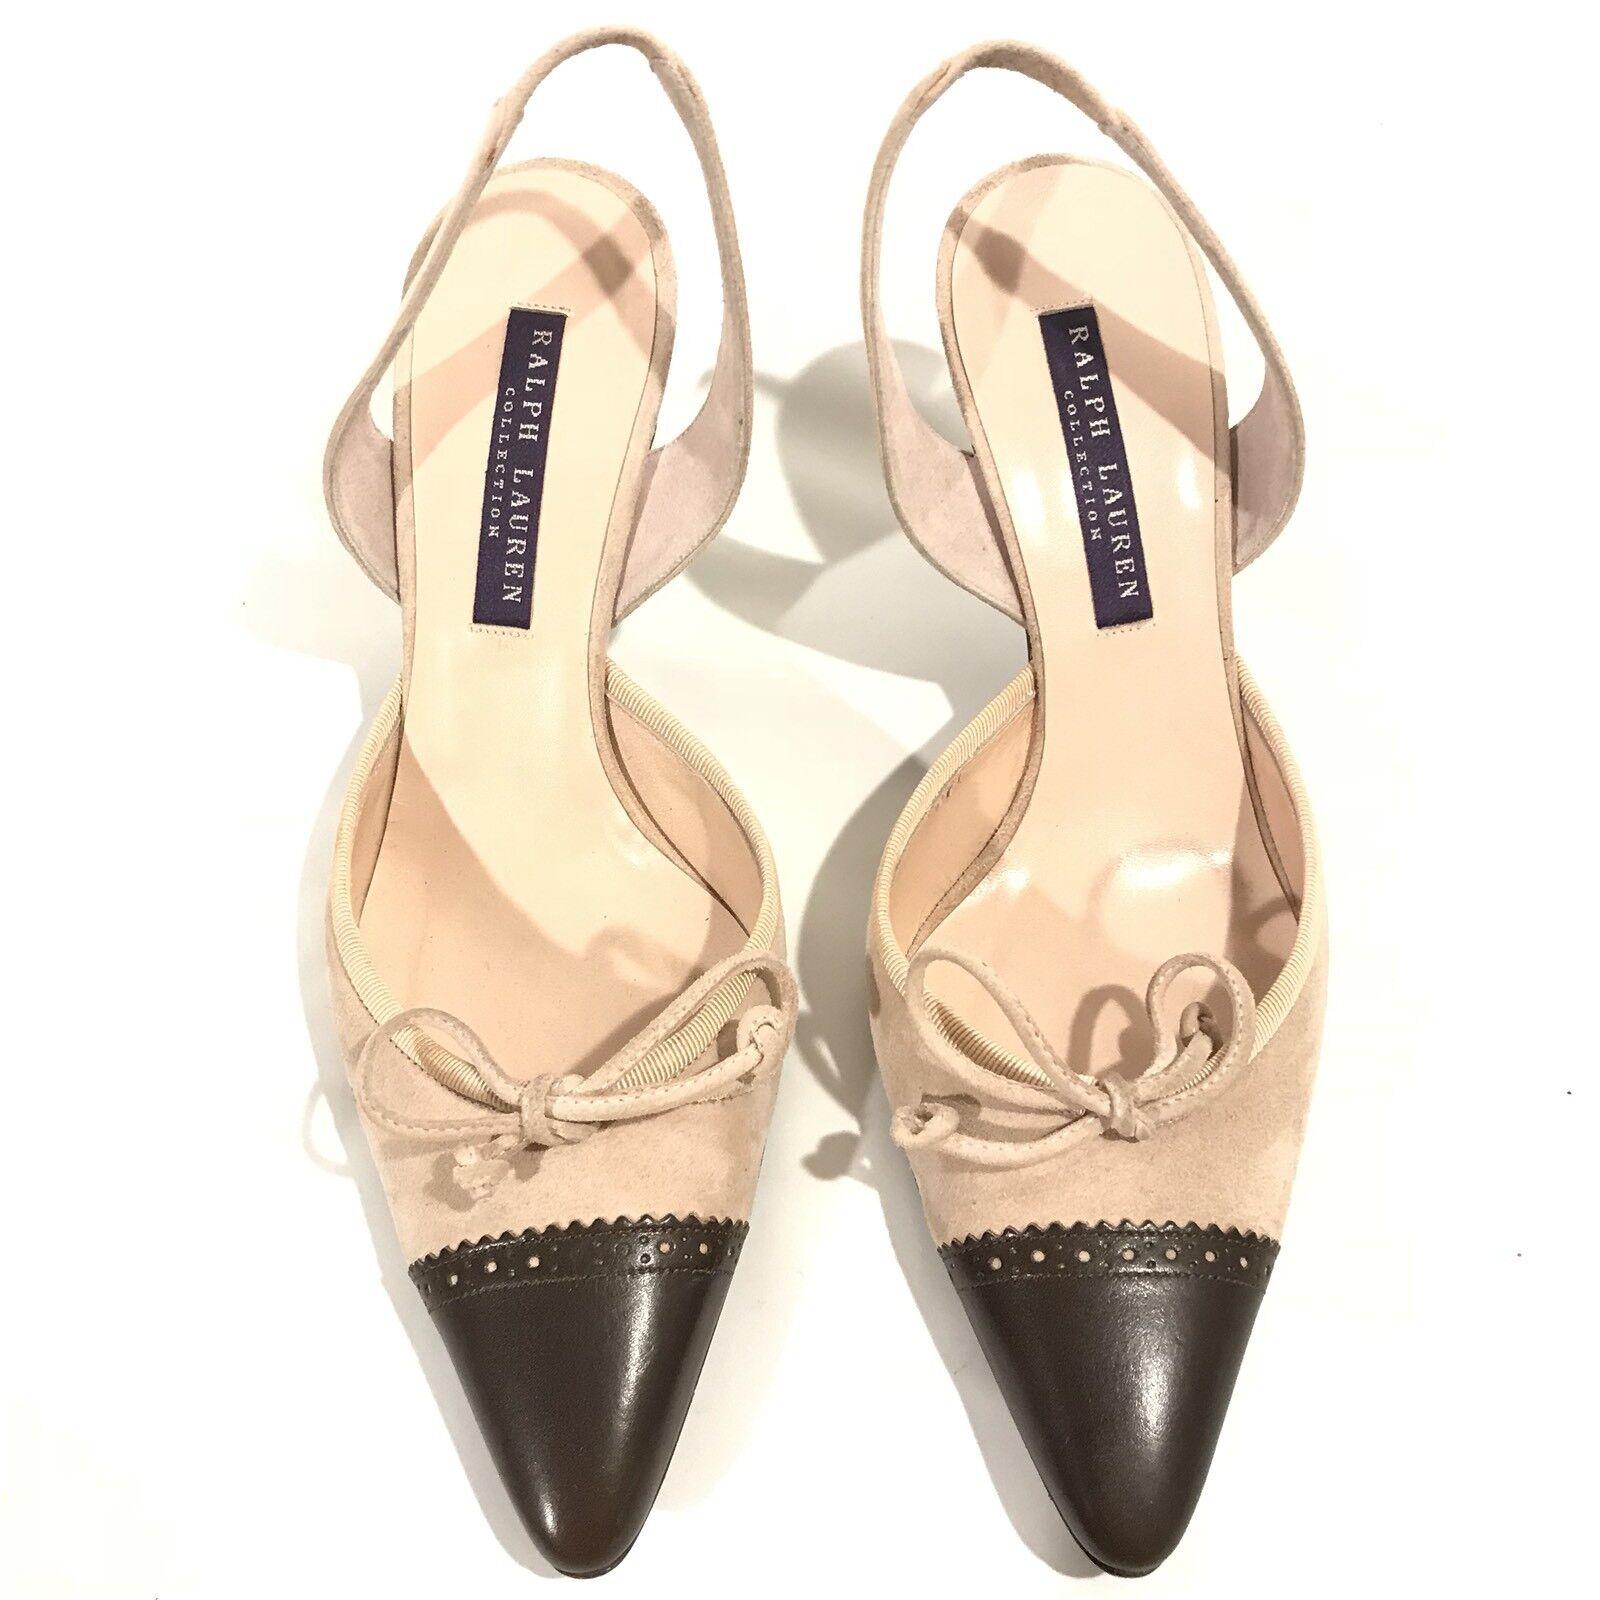 Ralph Lauren Collection Purple Label Slingback Pointed Toe Heels Heels Toe Sandal 6.5 320695